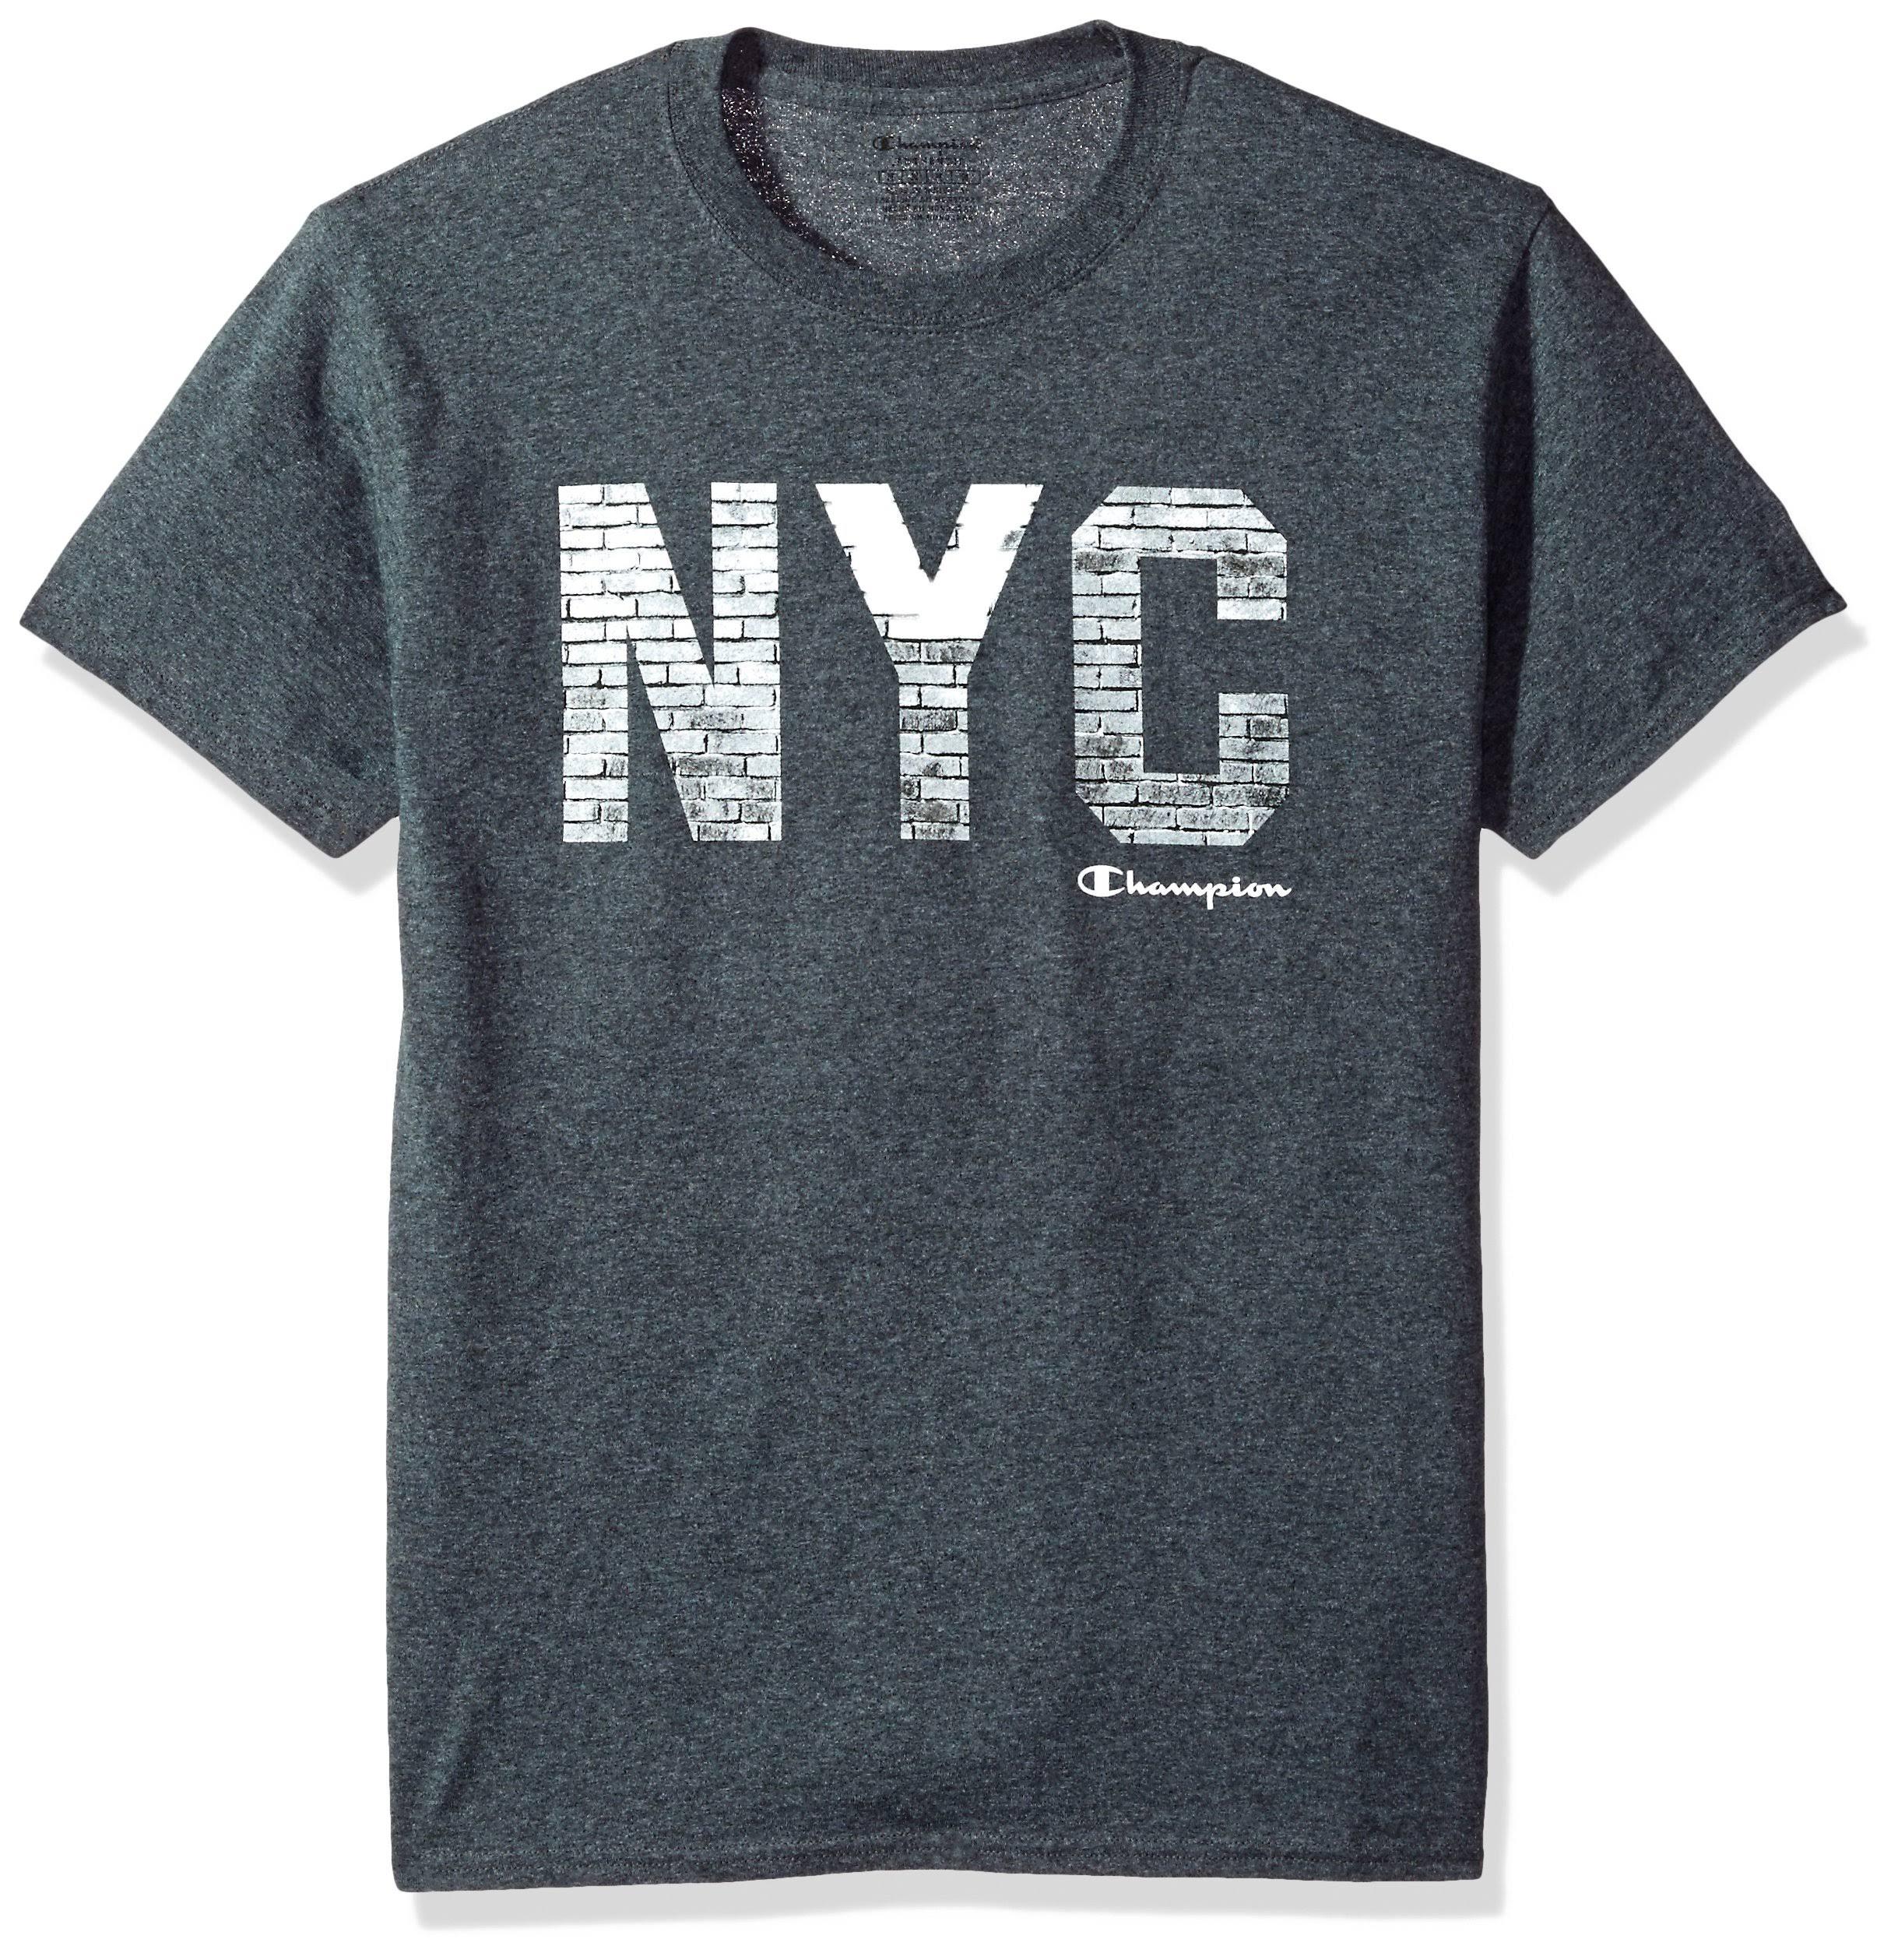 Classic Jersey City Champion Walls Heather Gráfico Camiseta Charcoal Mens p55qgZB